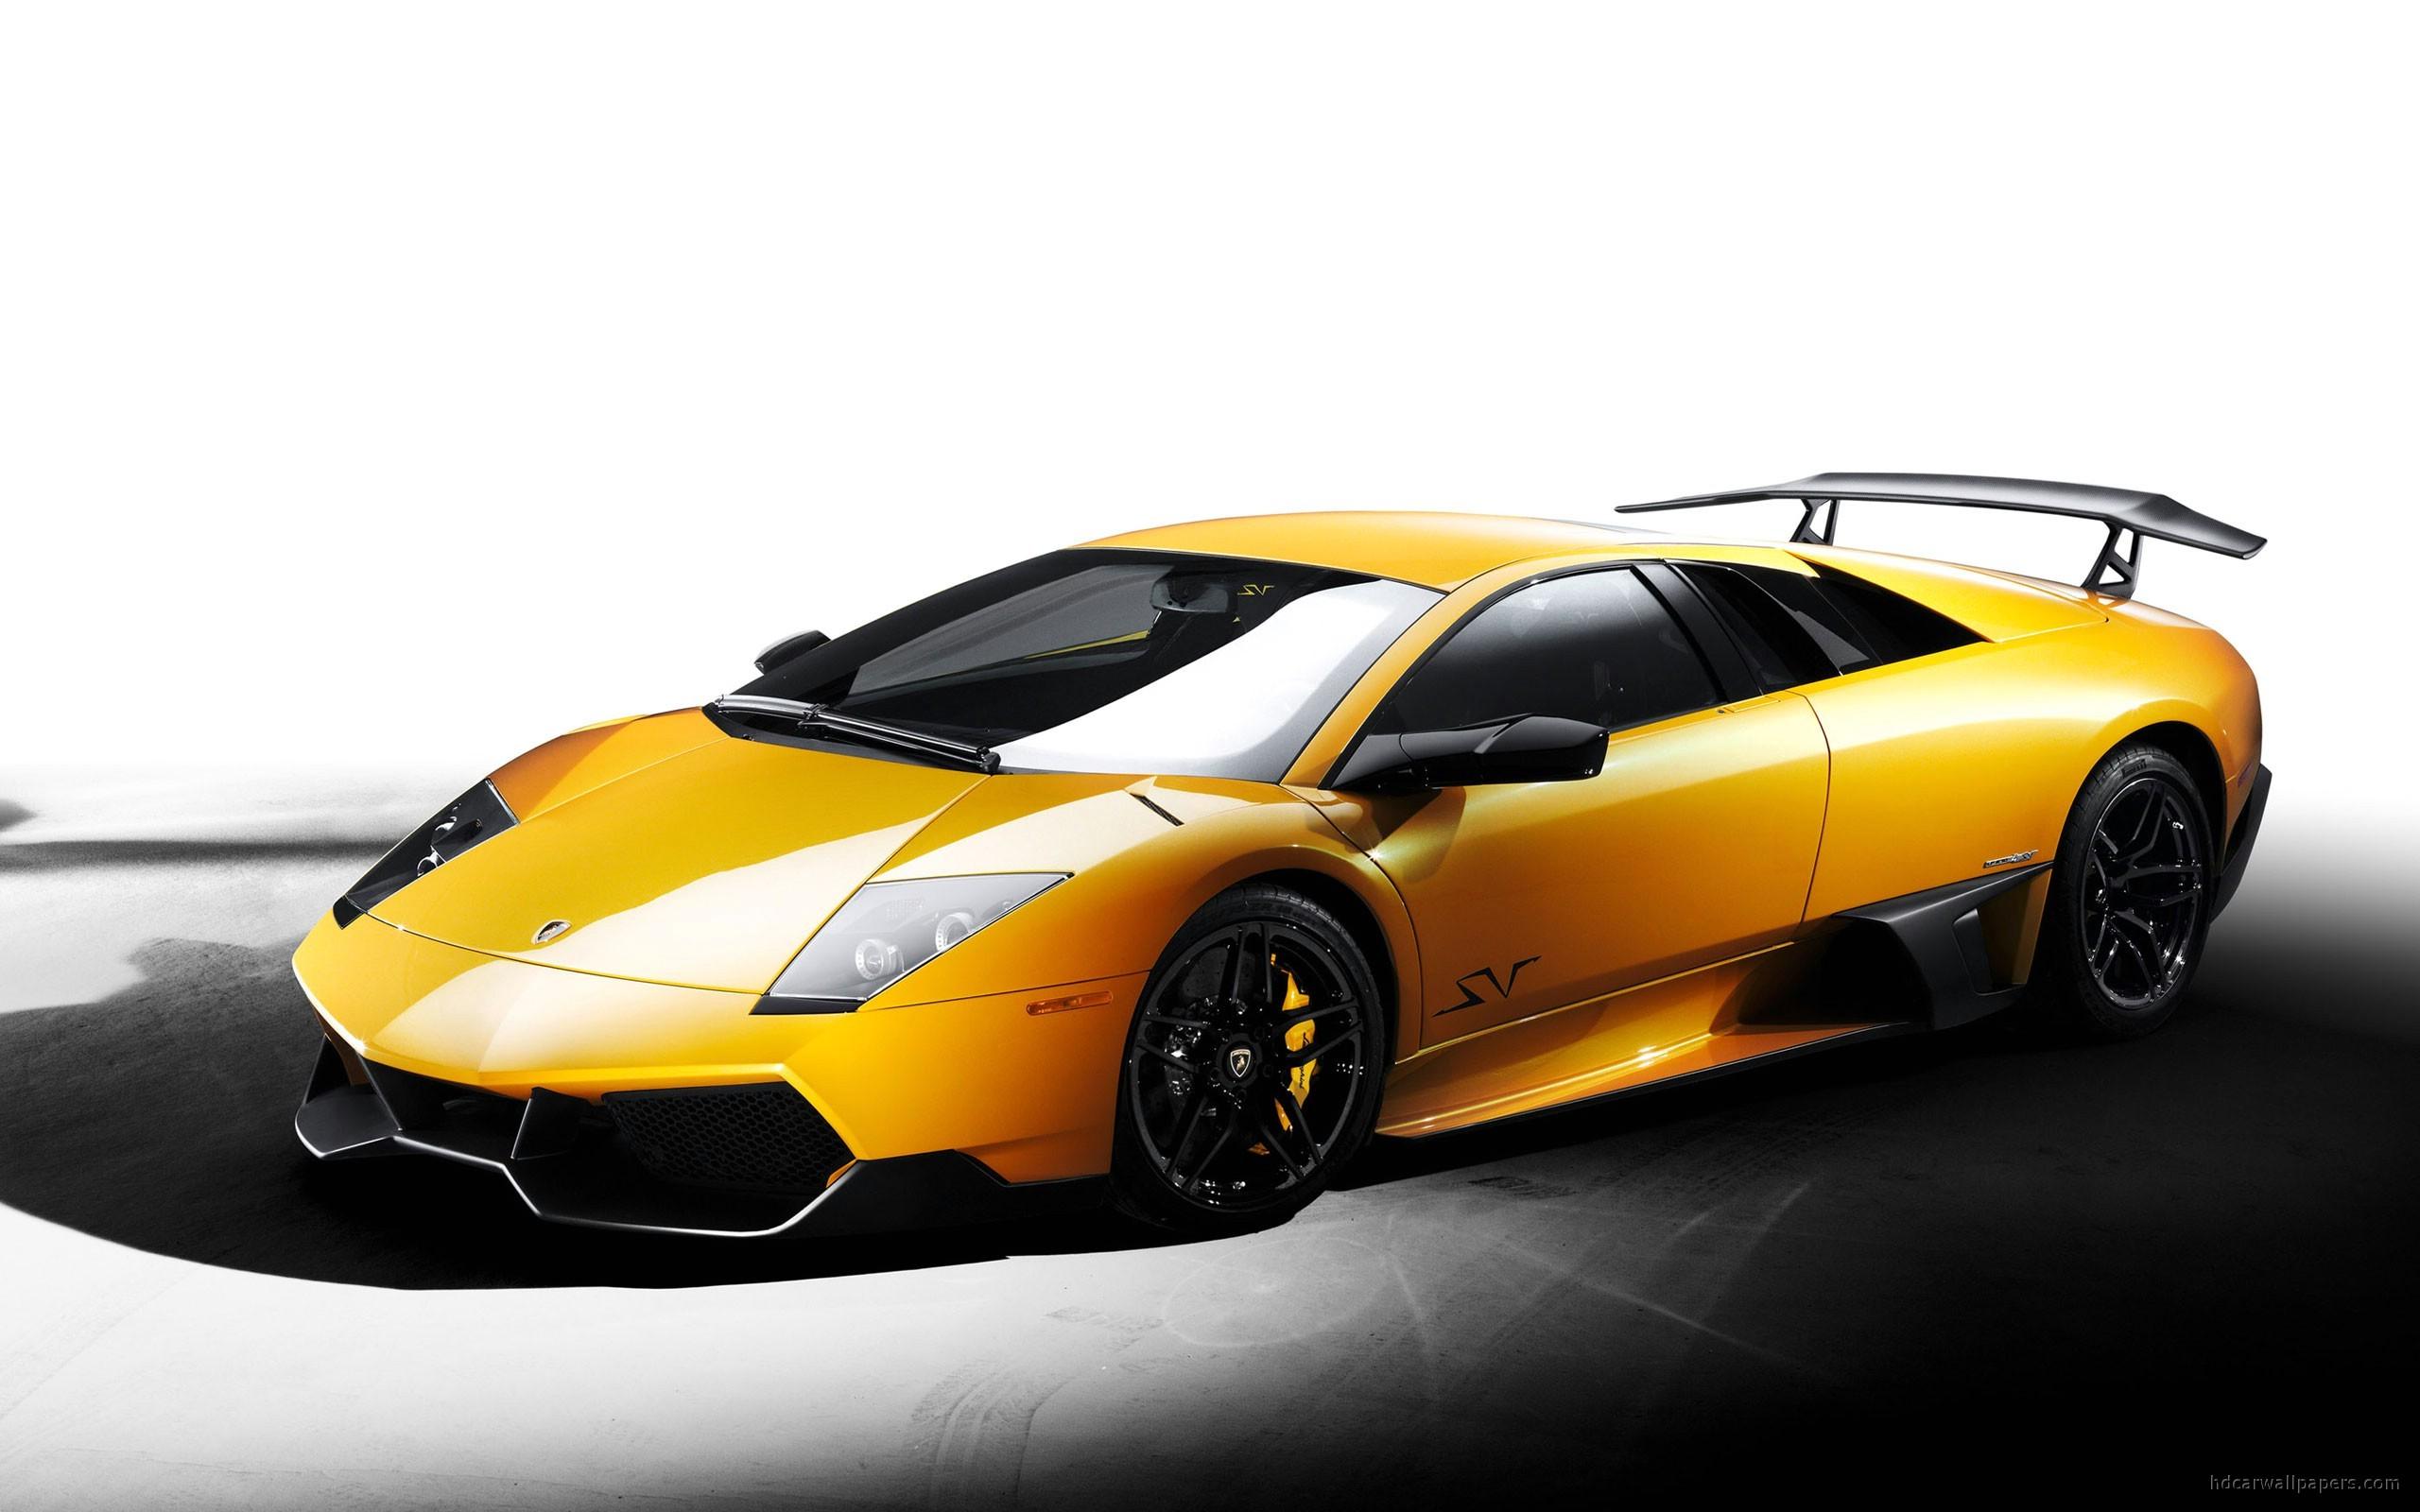 Lamborghini Murcielago Lp 670 4 Superveloce Wallpaper Hd